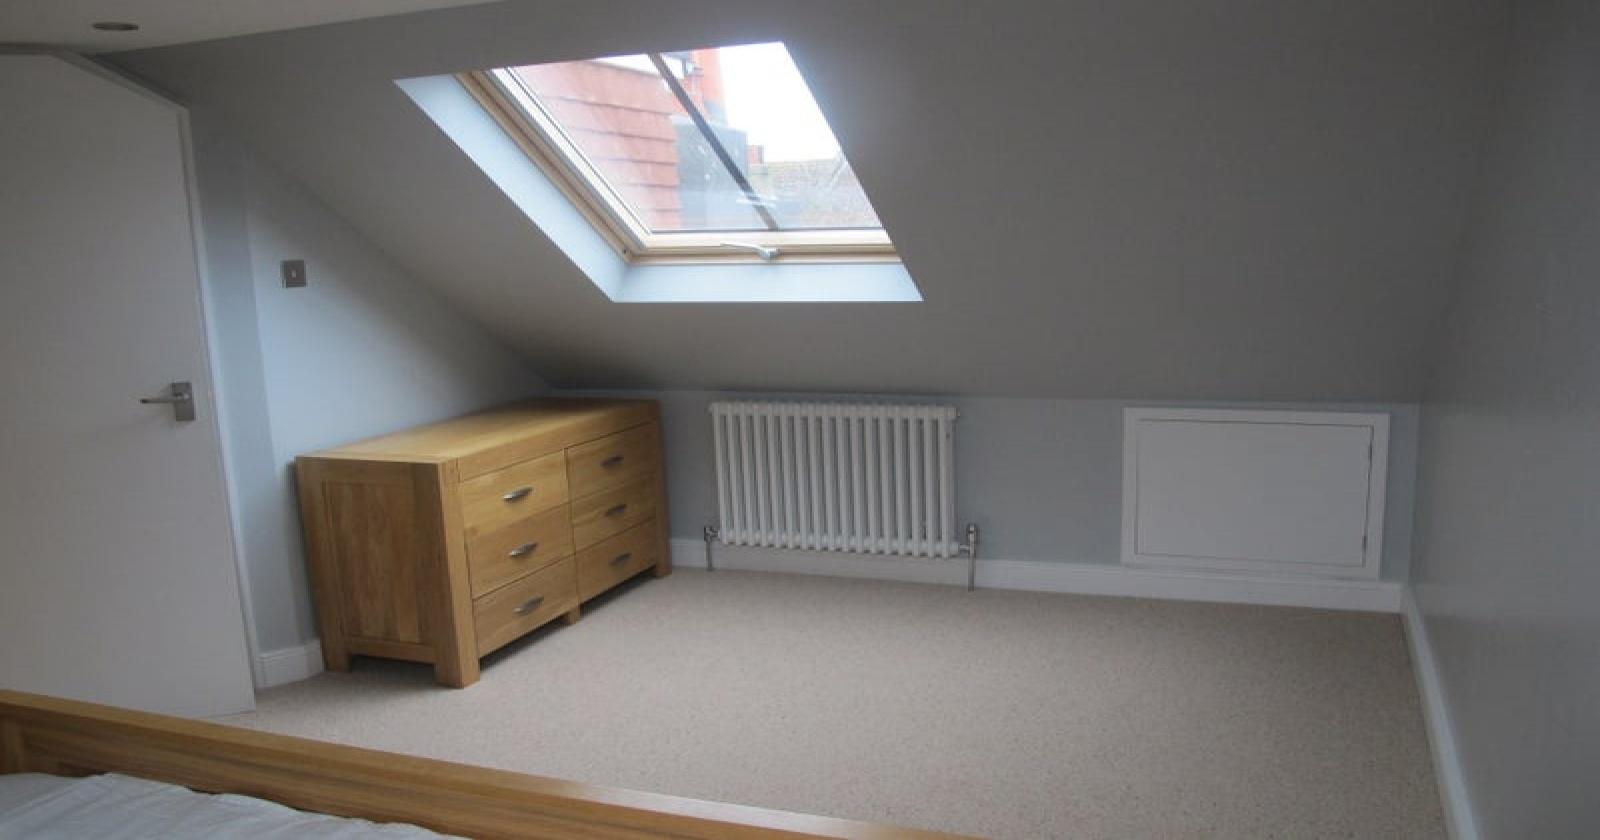 St Andrews Road Brighton, BRIGHTON, BN1 6EN, 1 Bedroom Bedrooms, 1 Room Rooms,1 BathroomBathrooms,Room,For Rent, St Andrews Road,1013